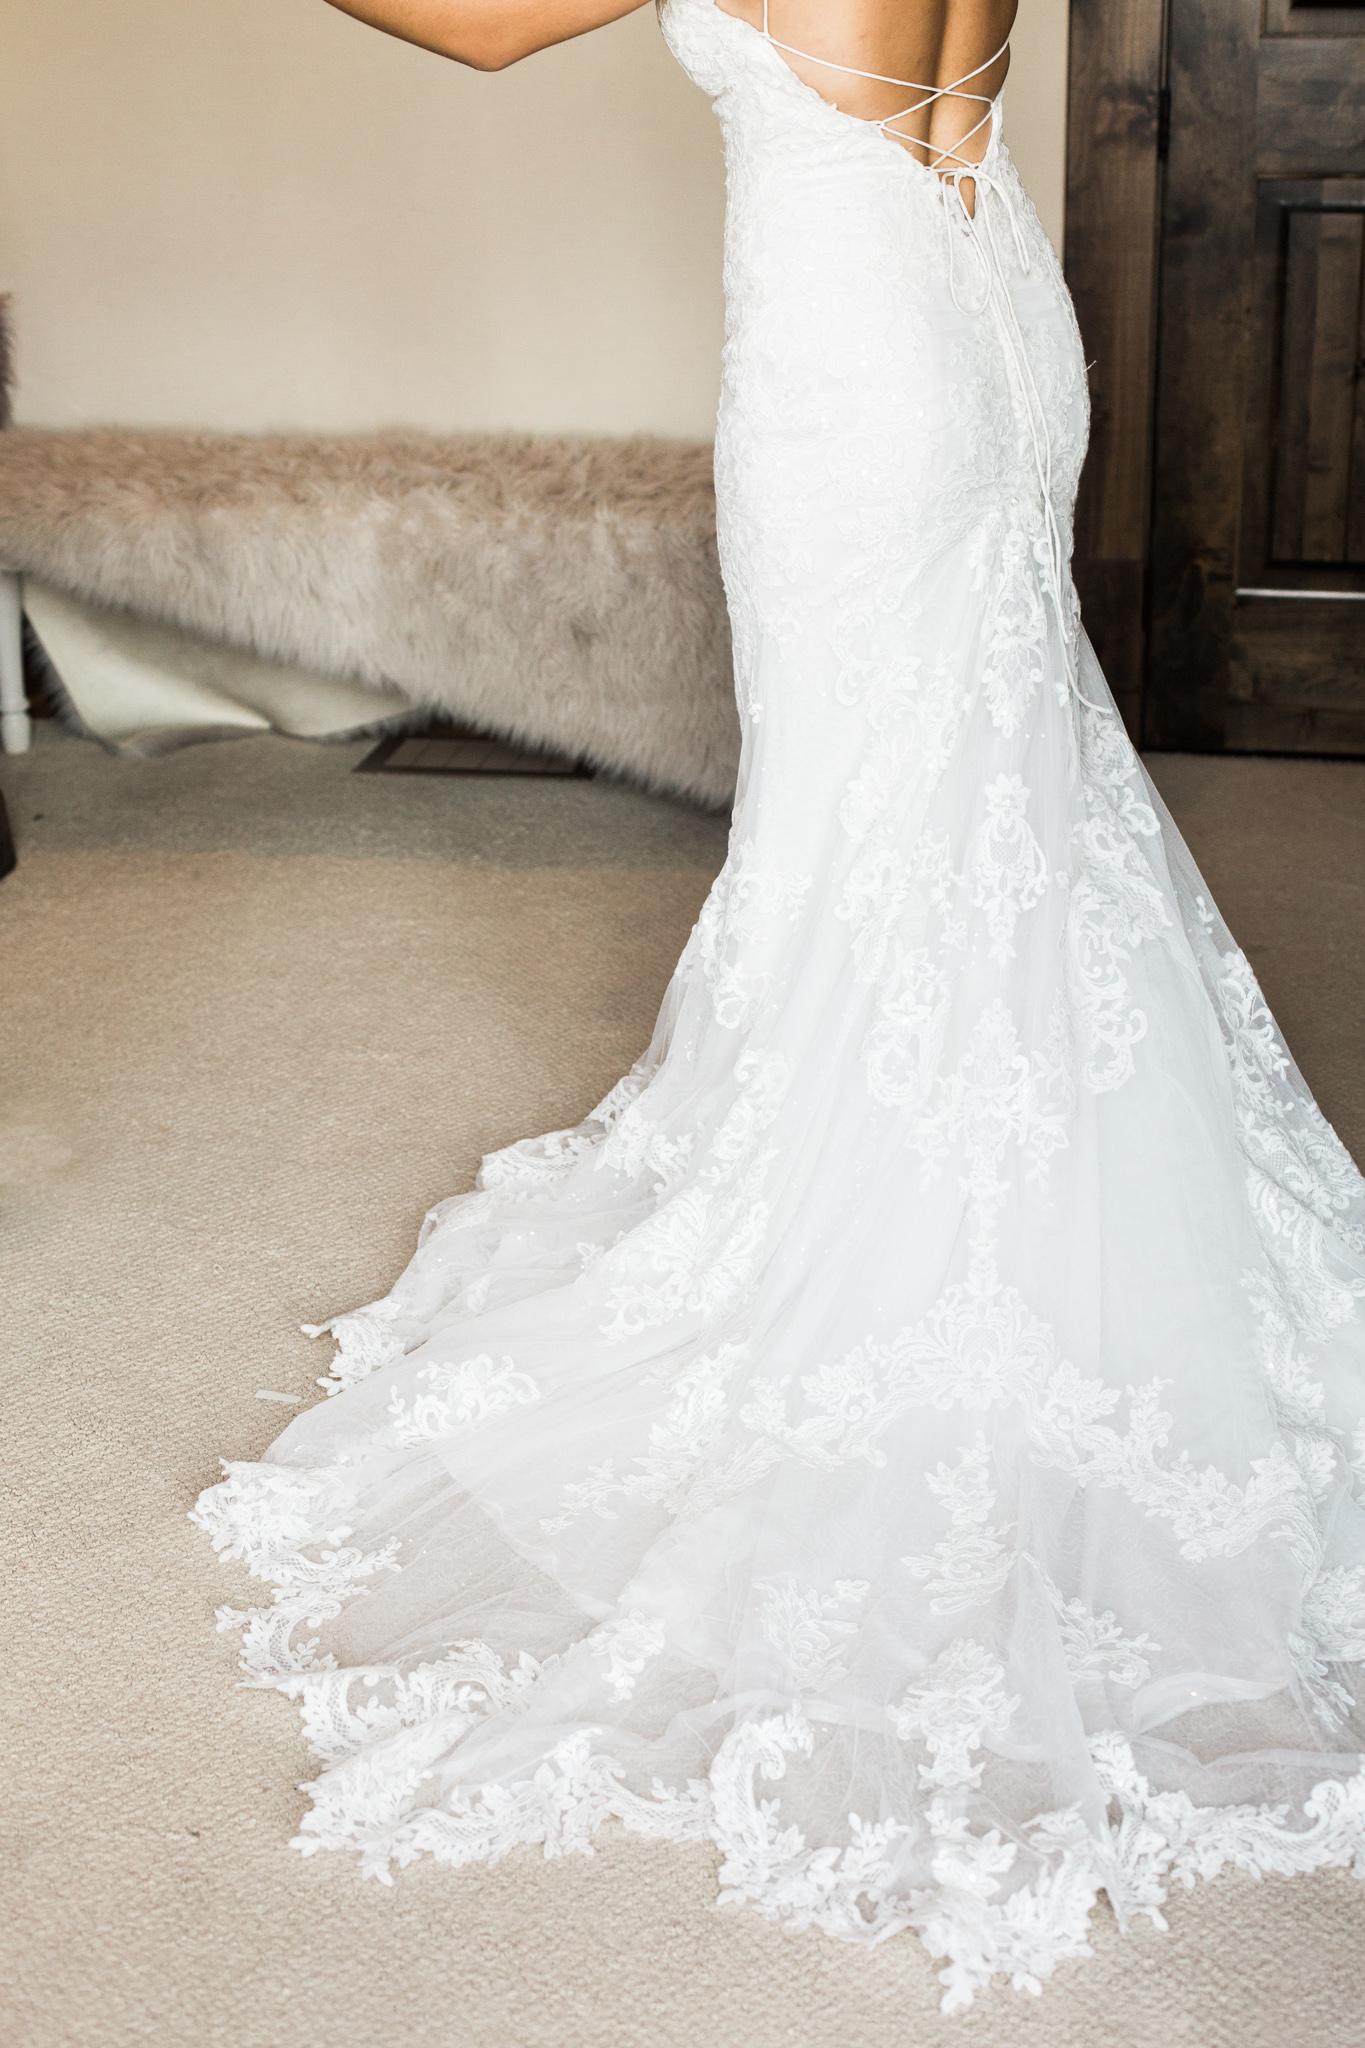 Olga_janni_wedding_090917_WEBSIZE (83 of 704).JPG